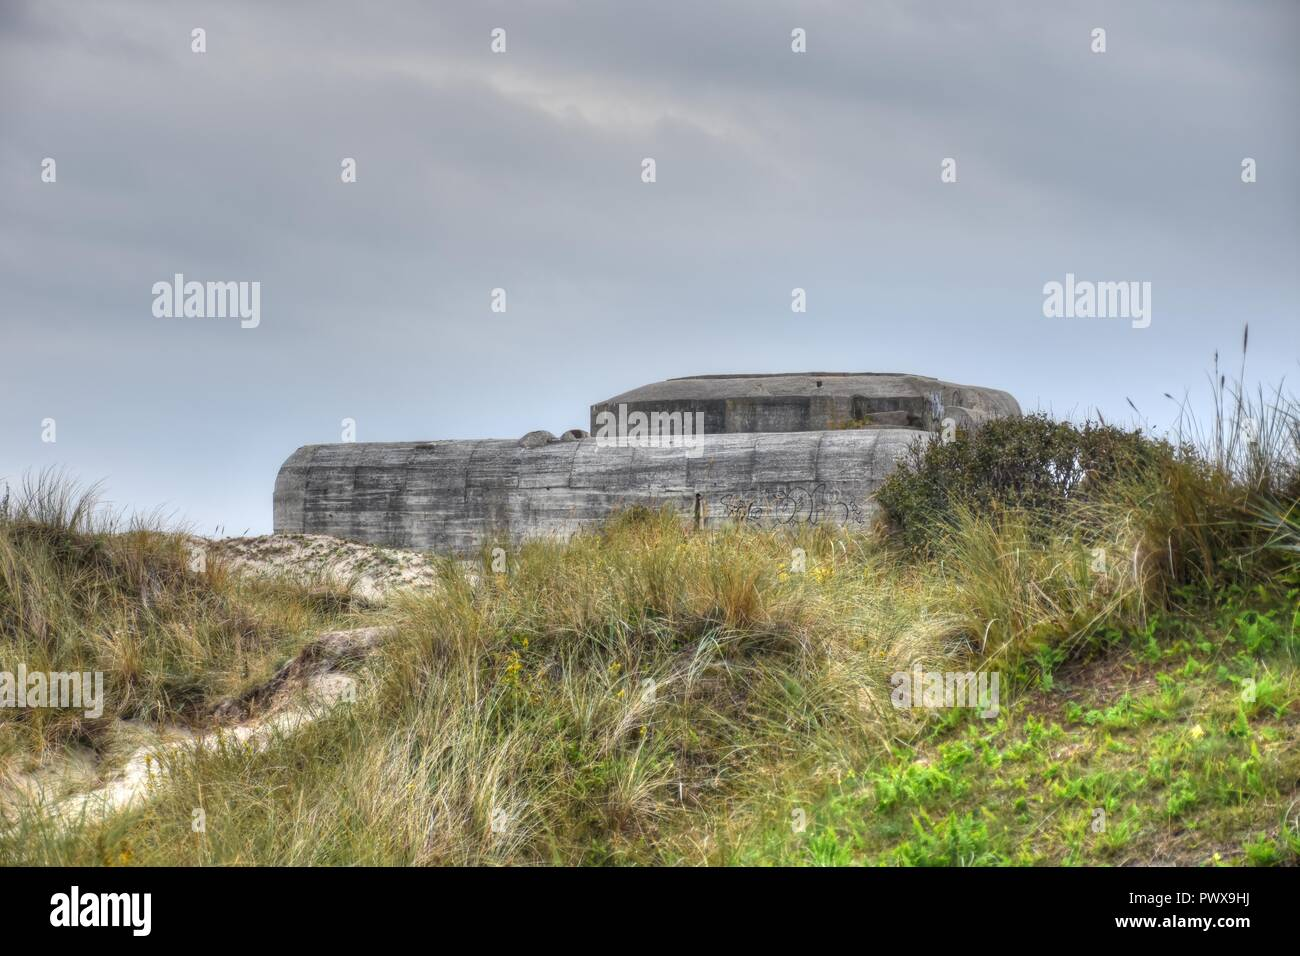 Dänemark, Skagen, Bunker, Ruine, Festung, Weltkrieg, Regelbau 638, Atlantikwall, Nordjylland, Frederikshavn, Skagerrak, Gränen, Kattegat, Landspitze - Stock Image